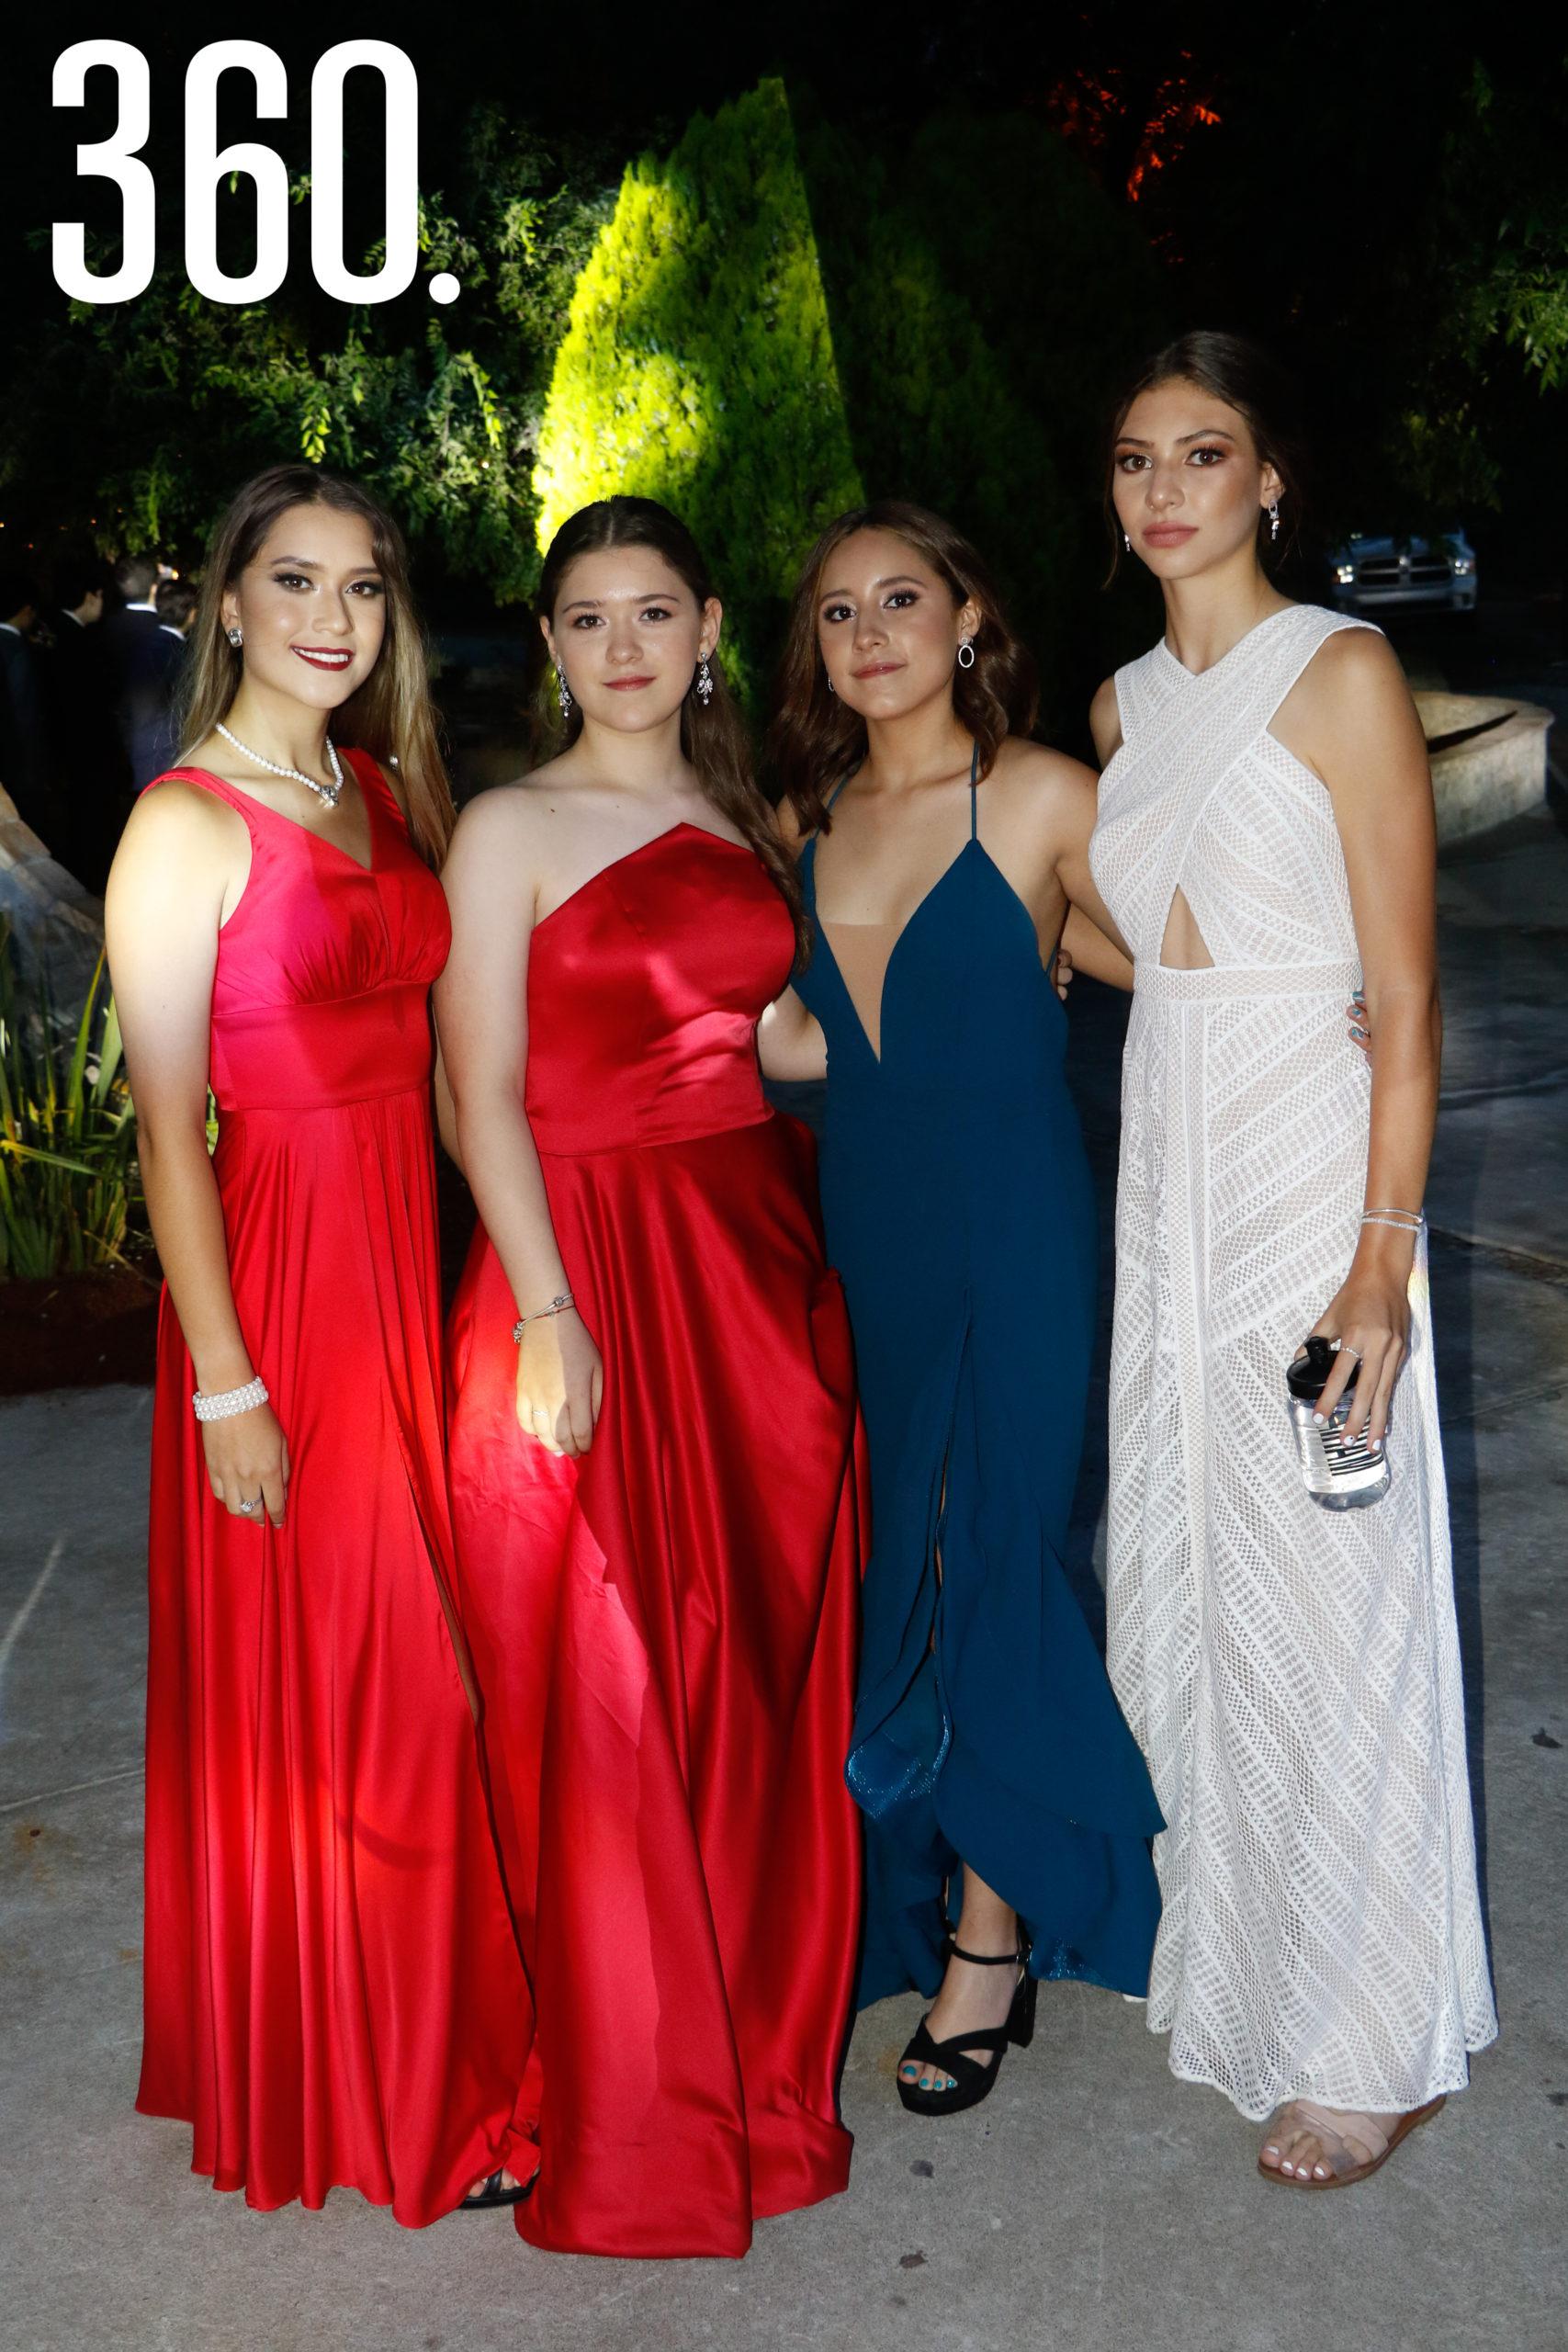 Ana Paloma Hernández, Mariángela Lozano, Isabel Sierra y Mariana Maldonado.